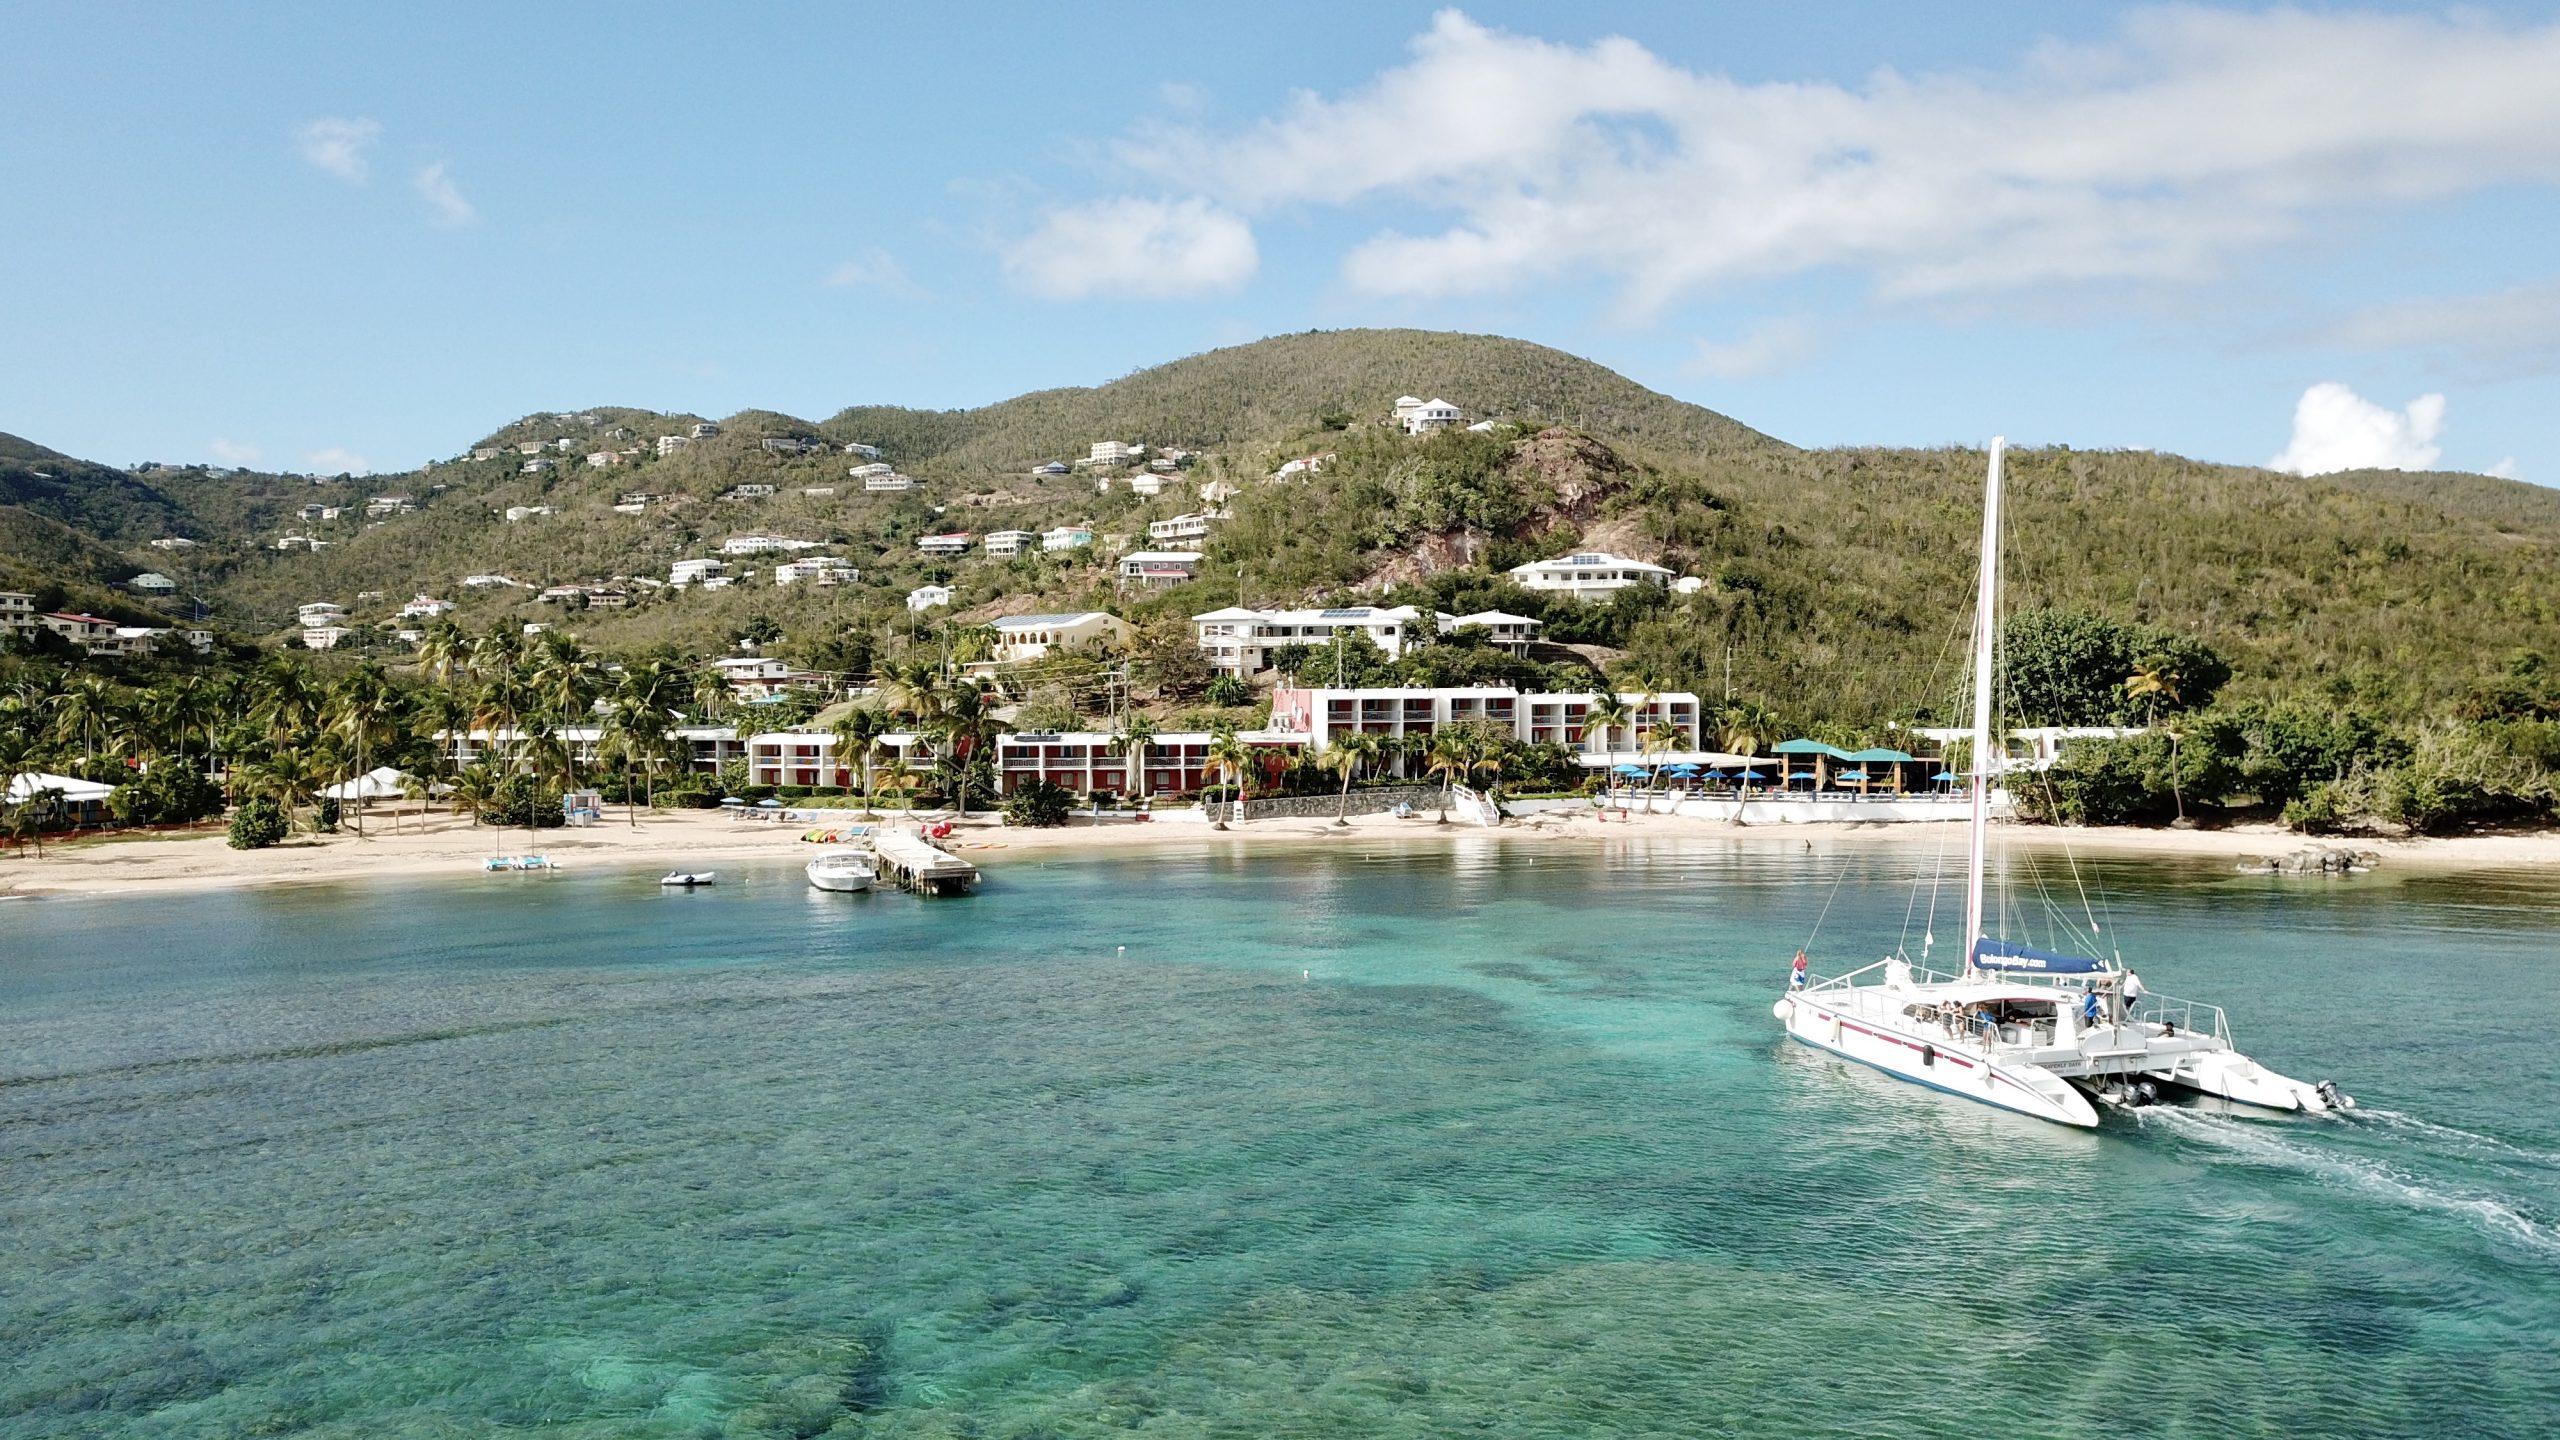 All Inclusive Caribbean Honeymoon Packages In St Thomas Us Virgin Islands